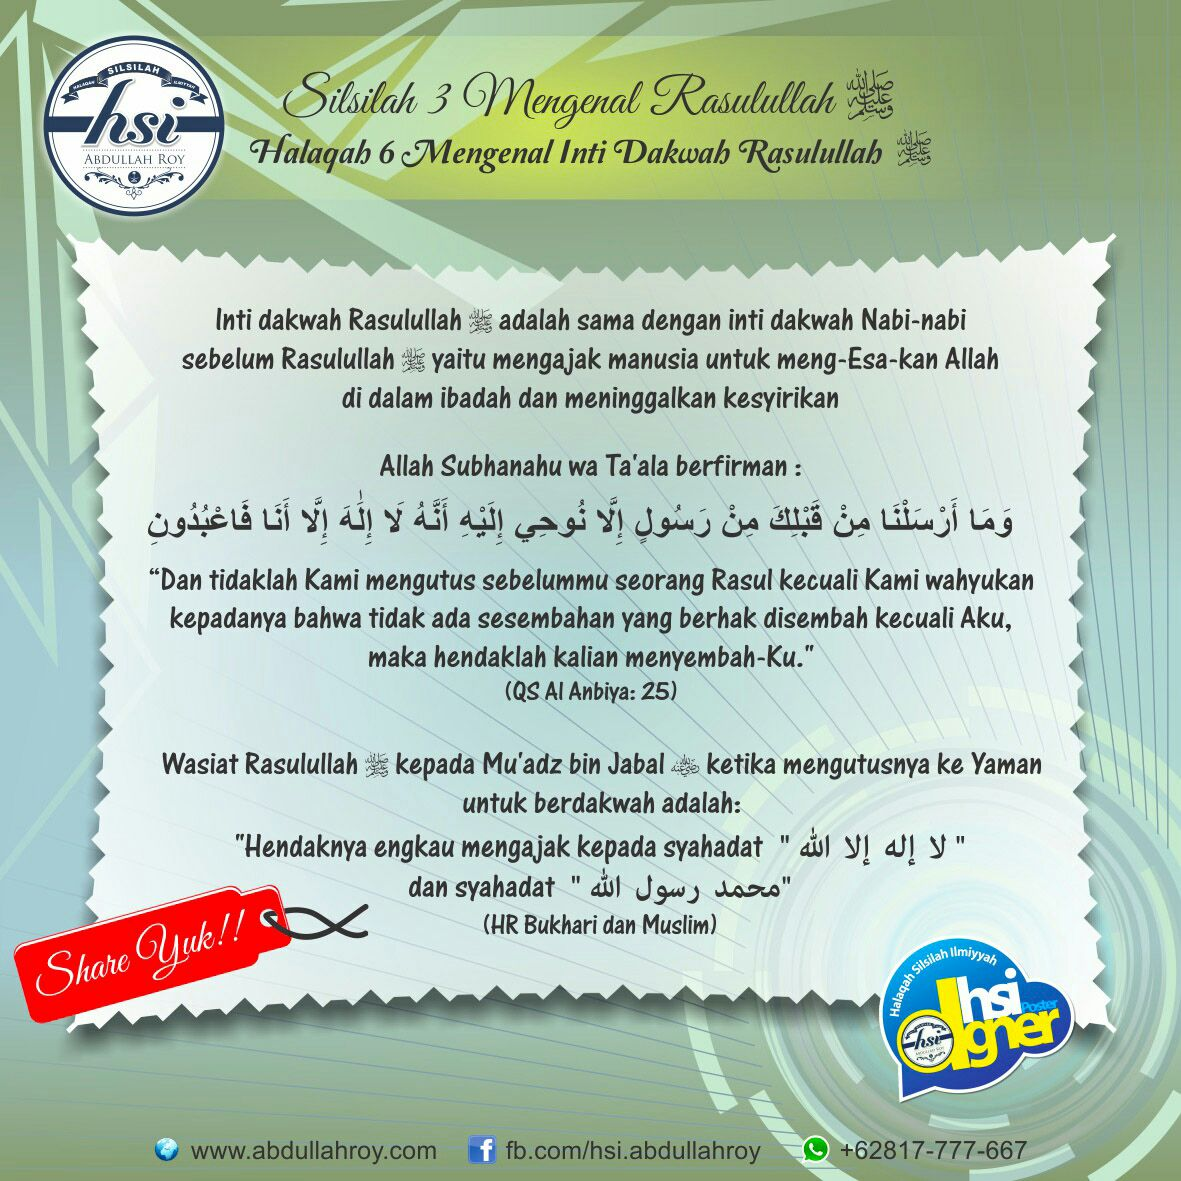 Jejak Kehidupan: Rangkuman Halaqah Silsilah Ilmiyah 3 ...